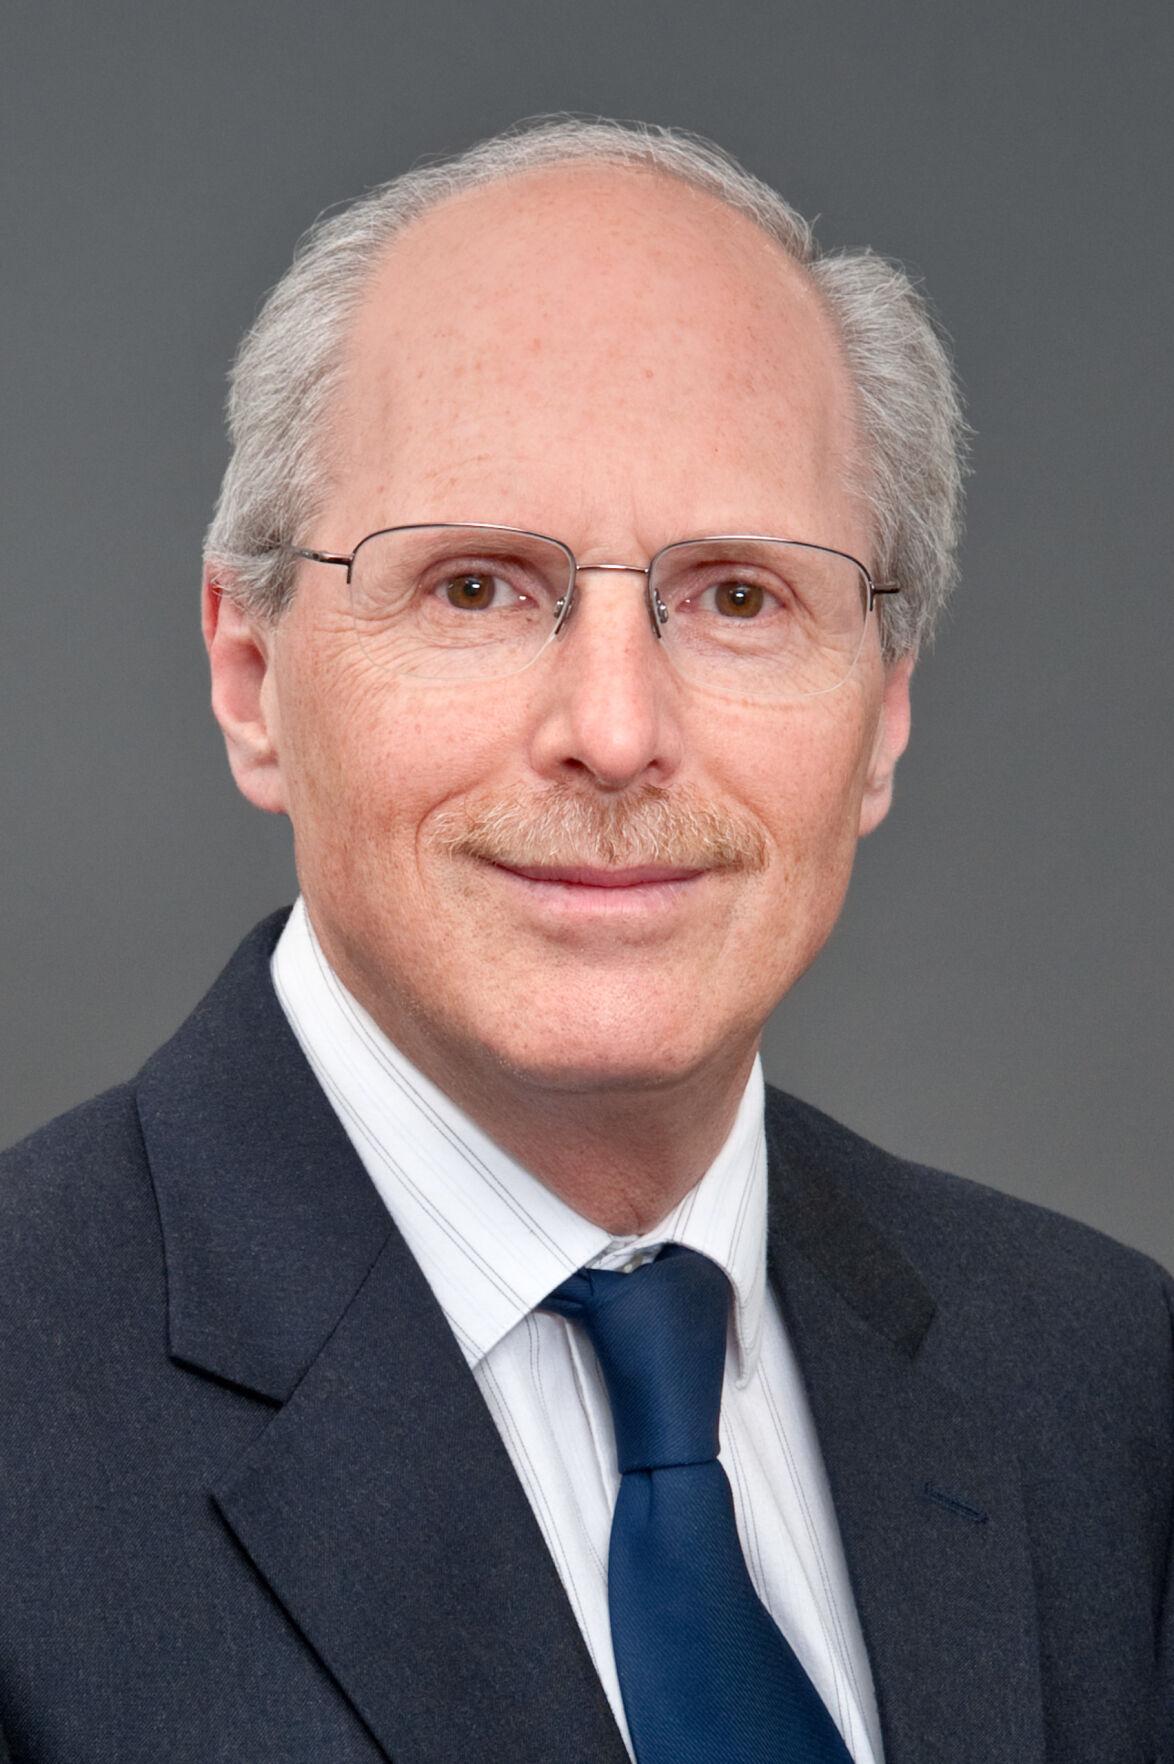 James (Jim) Cantor, Senior Vice President, Technical Director for Leidos